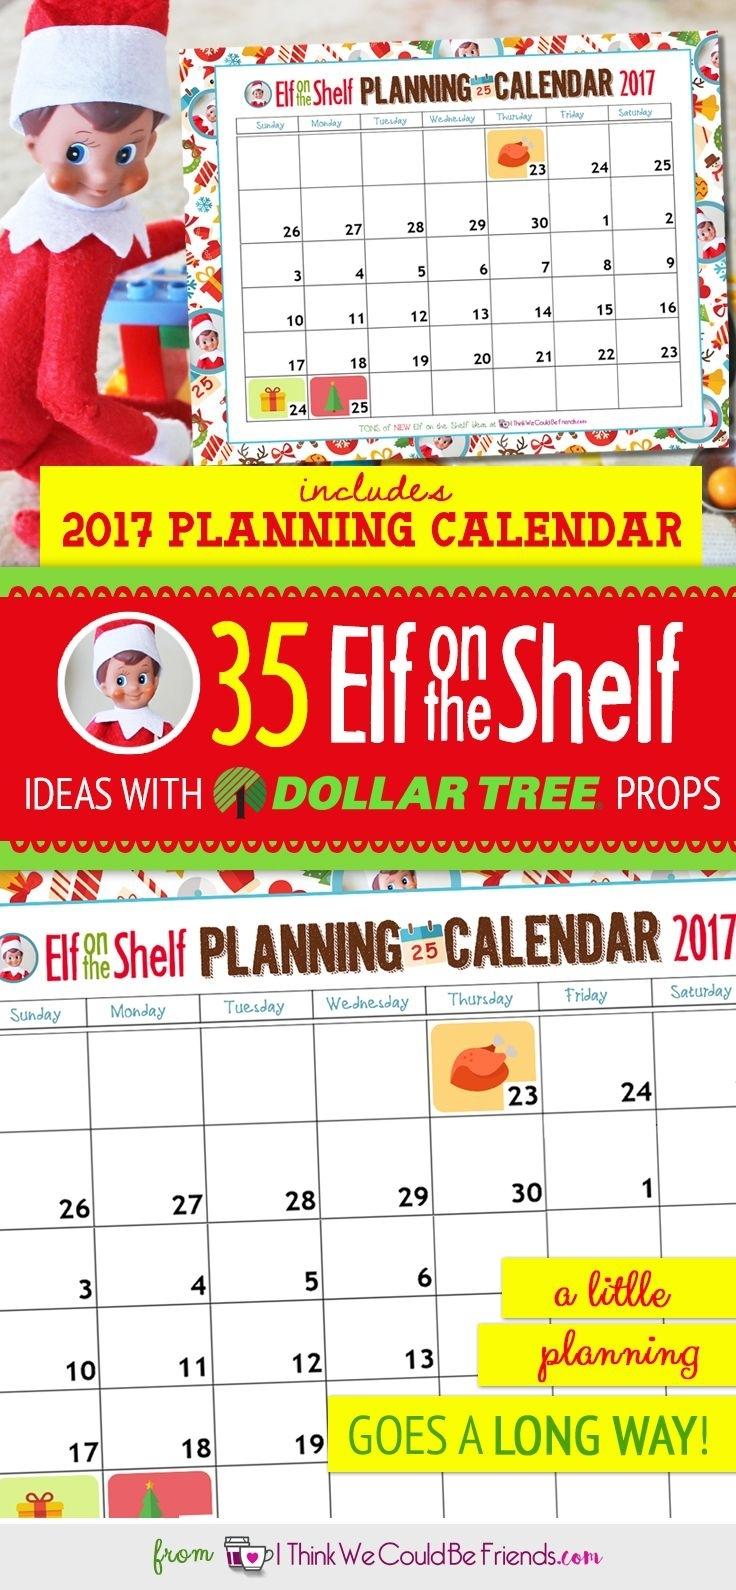 Free Printable Elf On The Shelf Planning Calendar For 2018! | Elf On with Free Printable Adult Superhero Calendars